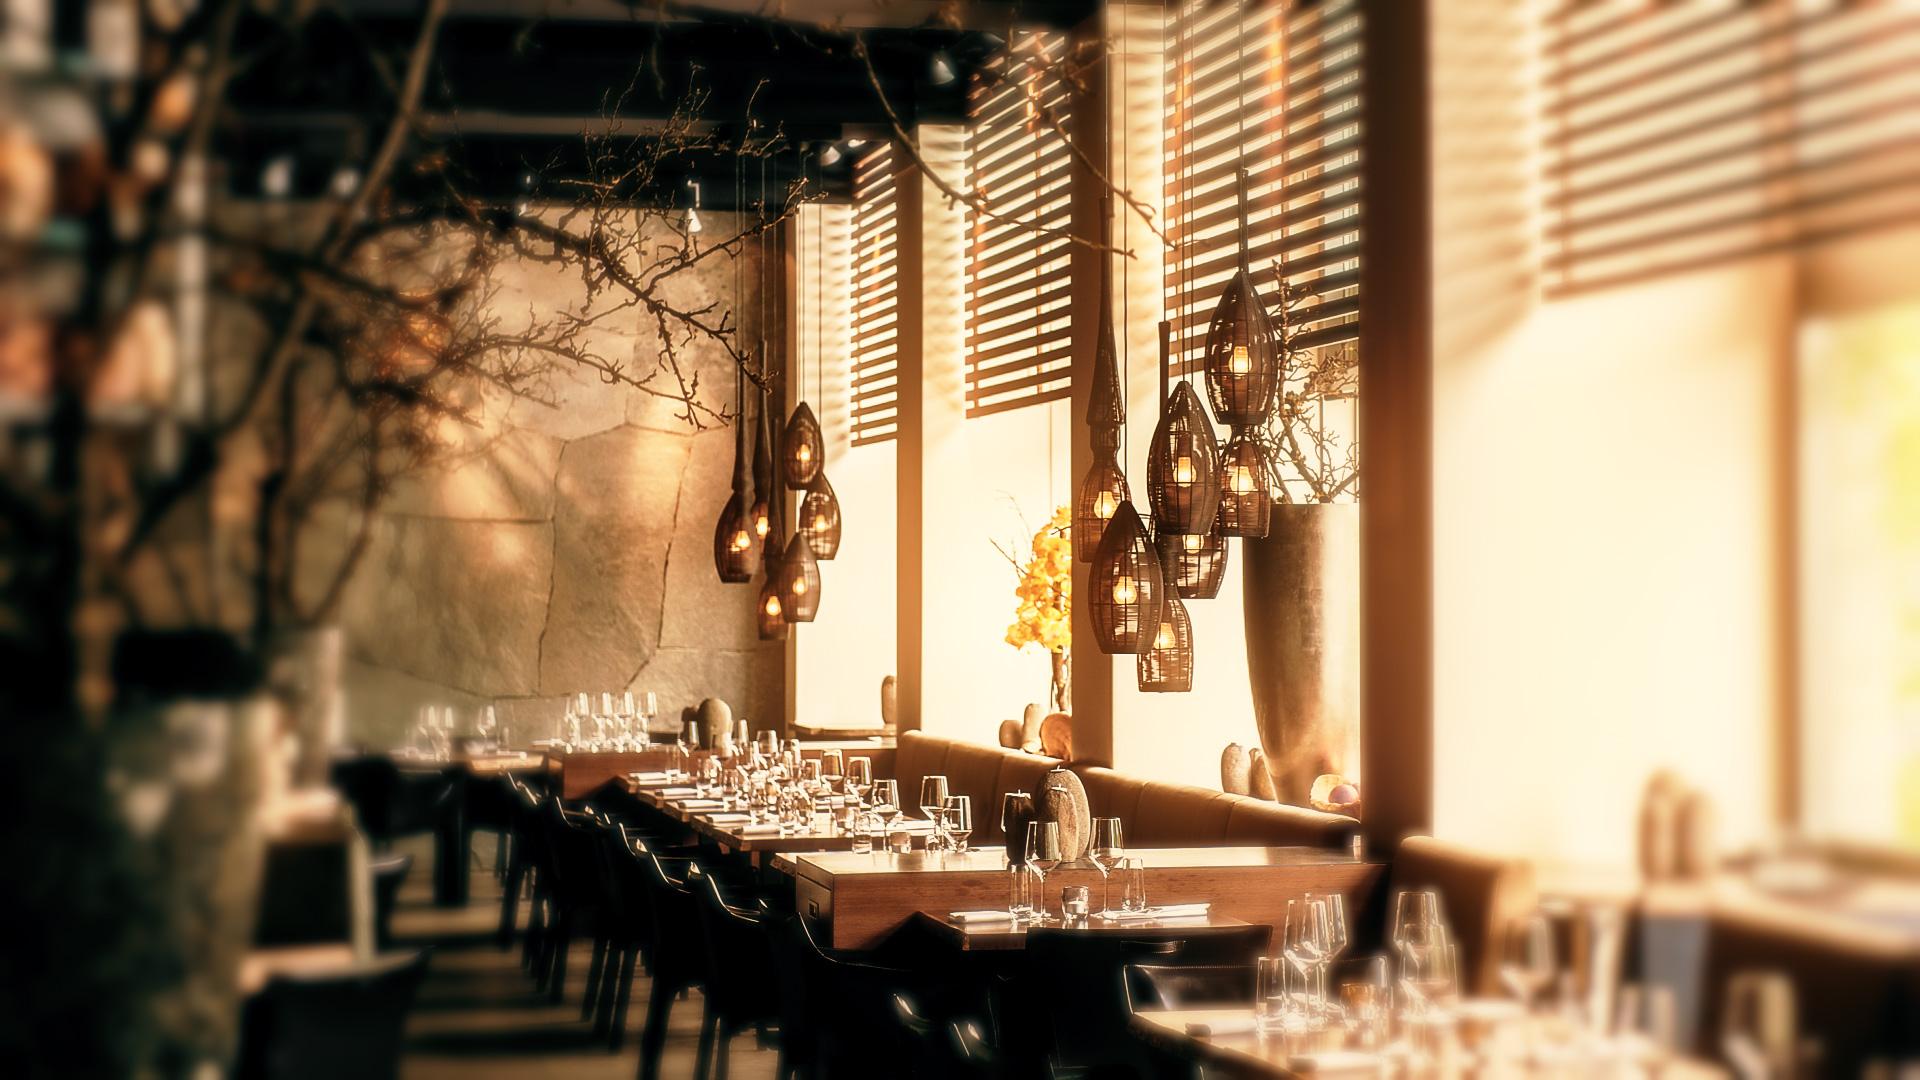 AURA 800° Grill & Bar